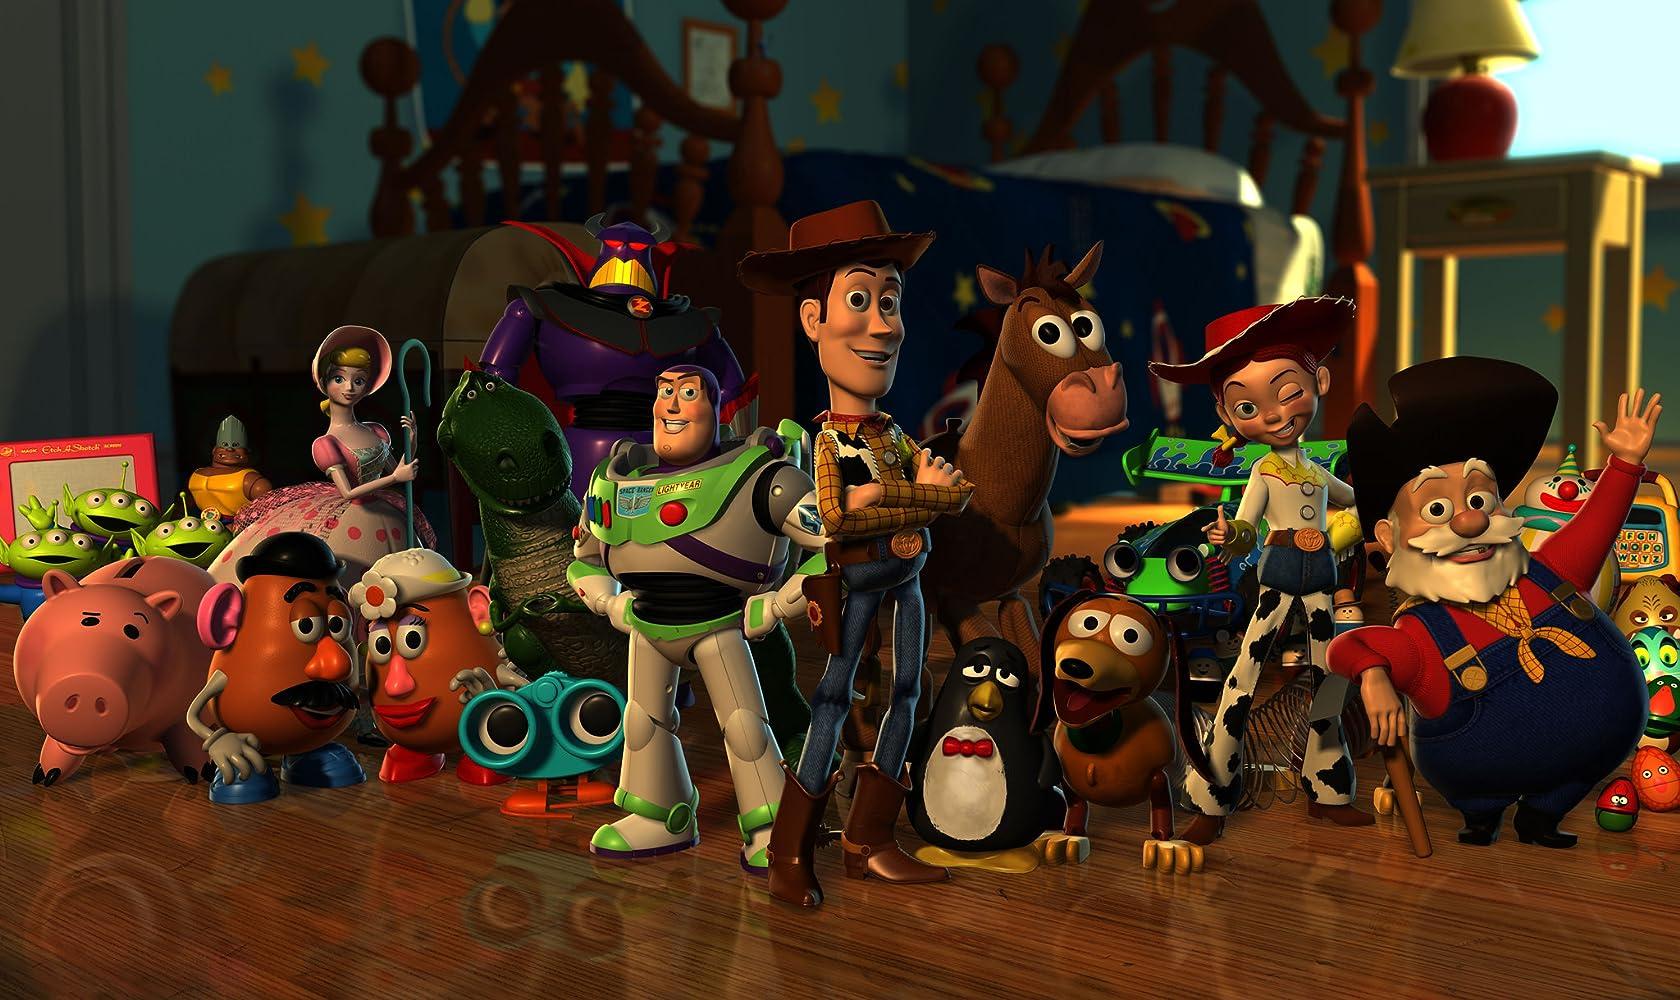 Tom Hanks, Joan Cusack, Tim Allen, Kelsey Grammer, Annie Potts, John Ratzenberger, Wallace Shawn, Jim Varney, Andrew Stanton, Estelle Harris, Jeff Pidgeon, Joe Ranft, and Don Rickles in Toy Story (1995)